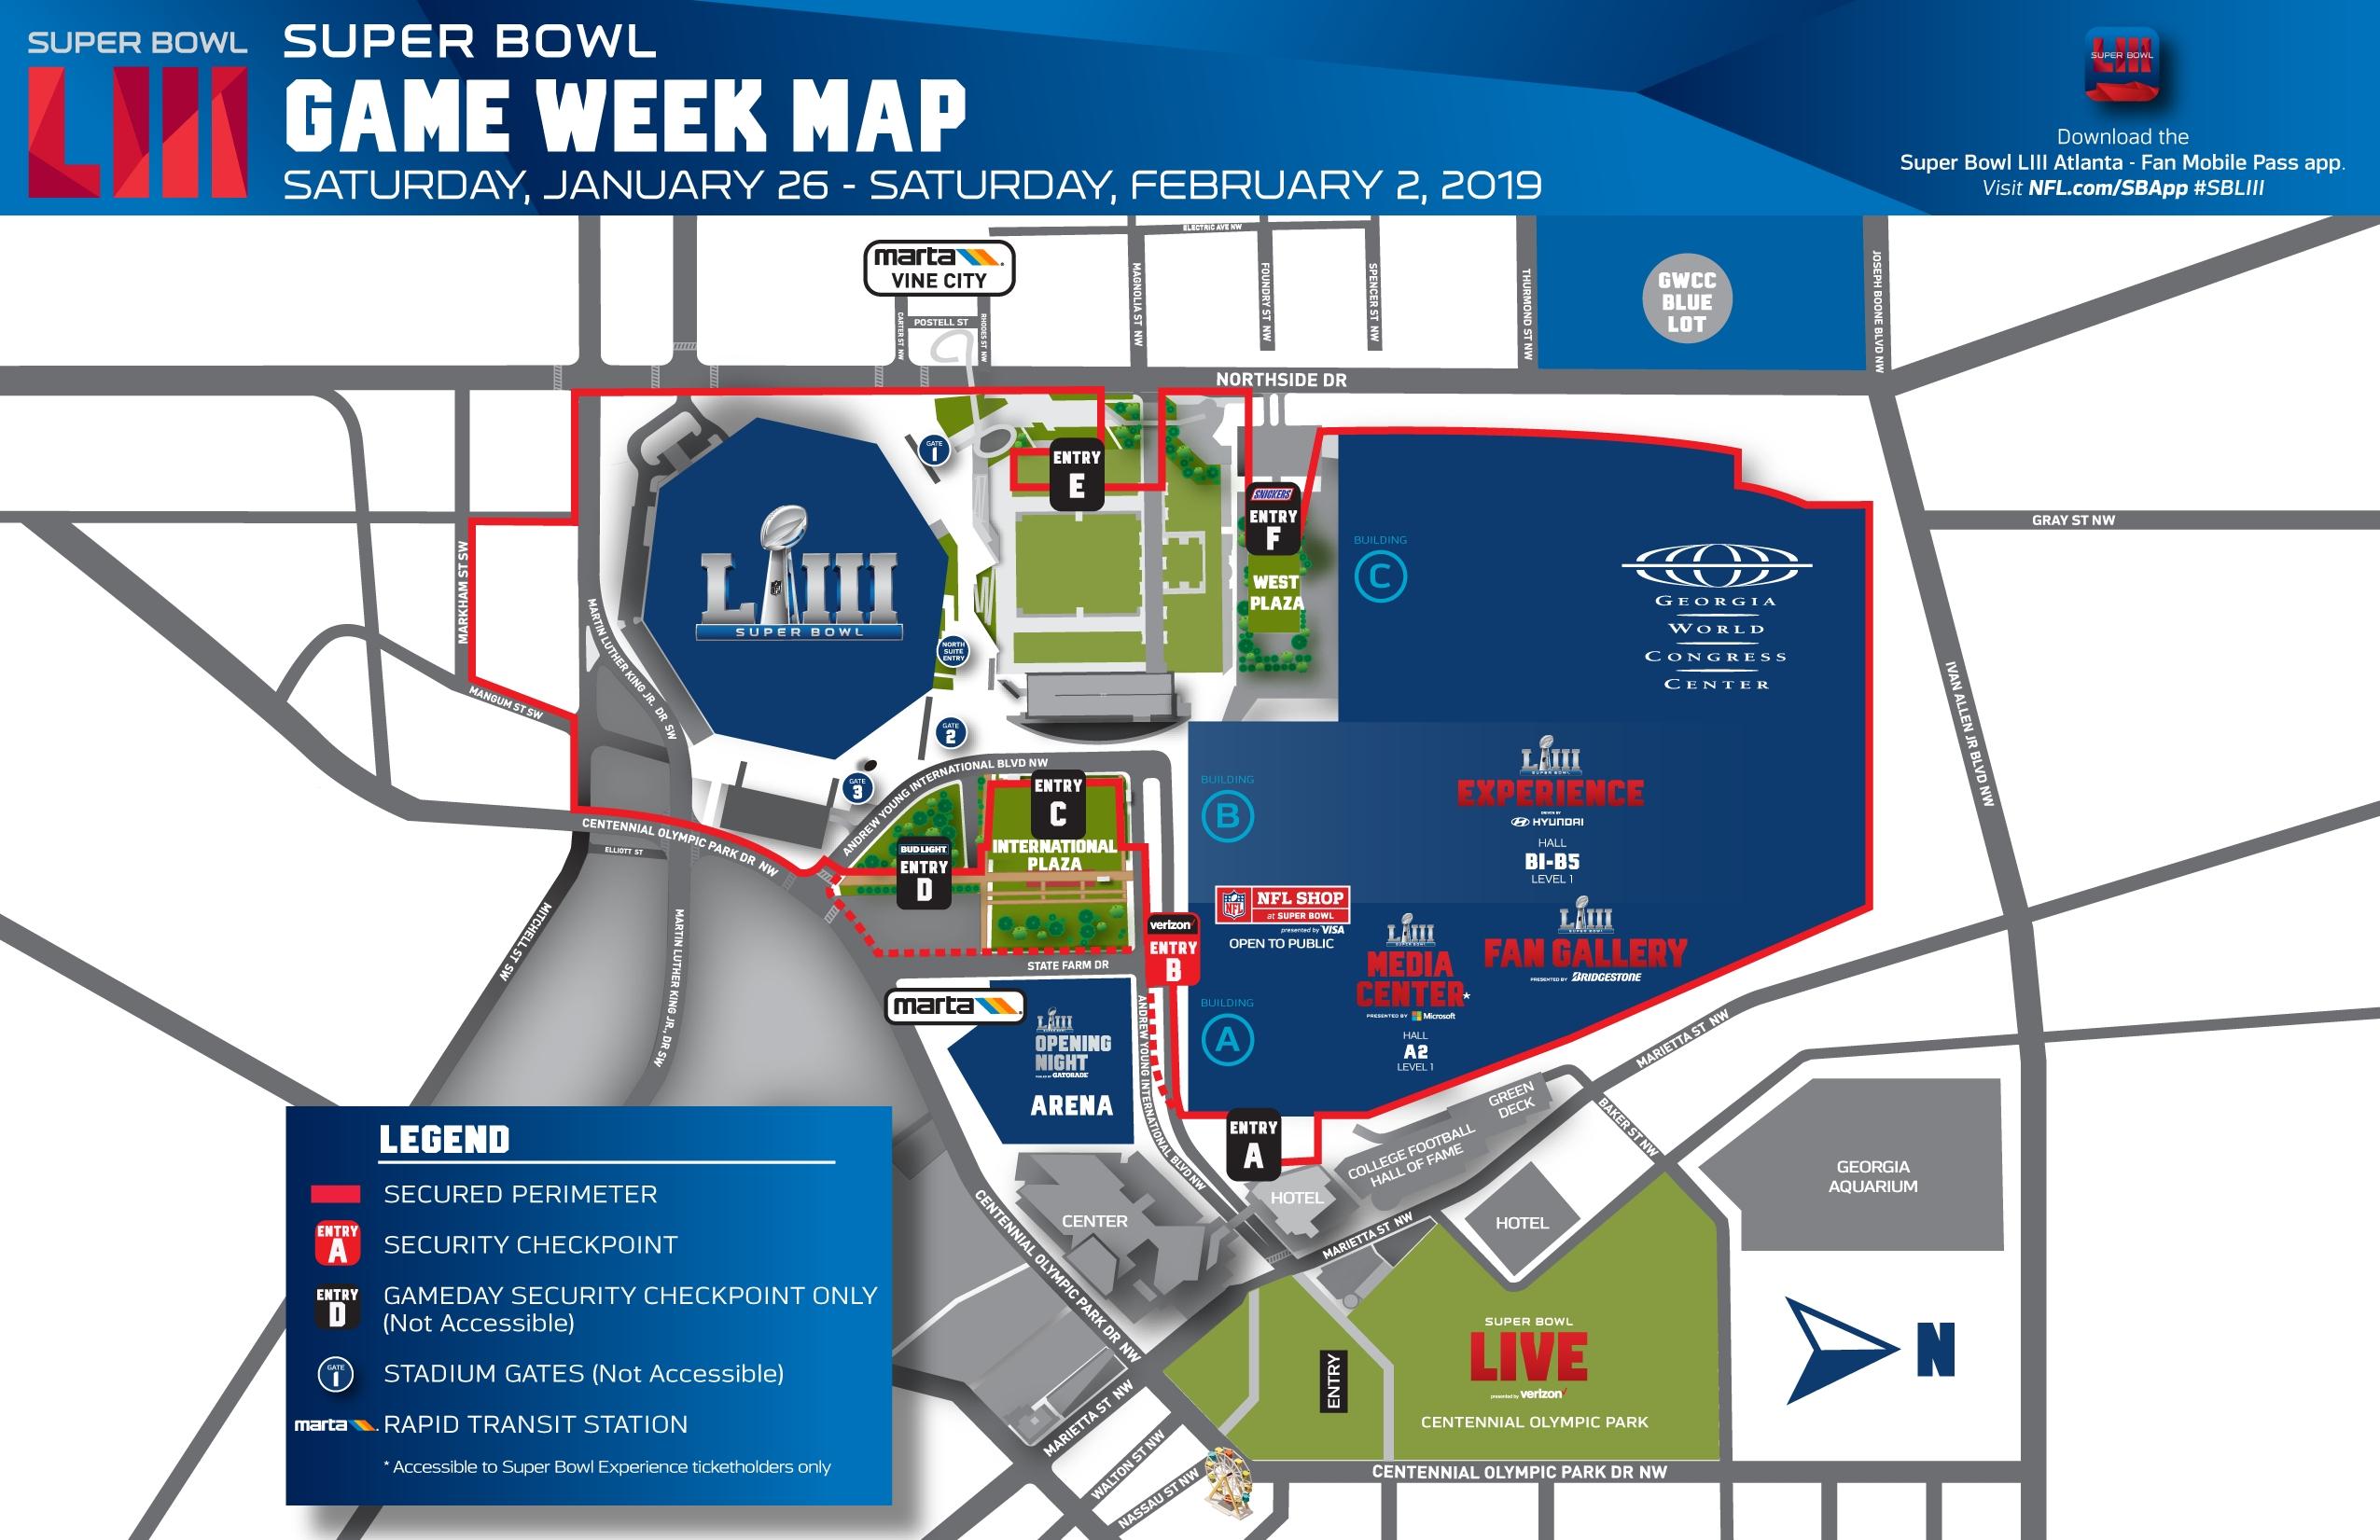 Super Bowl Hub - Mercedes Benz Stadium in Super Bowl Seating Chart Atlanta